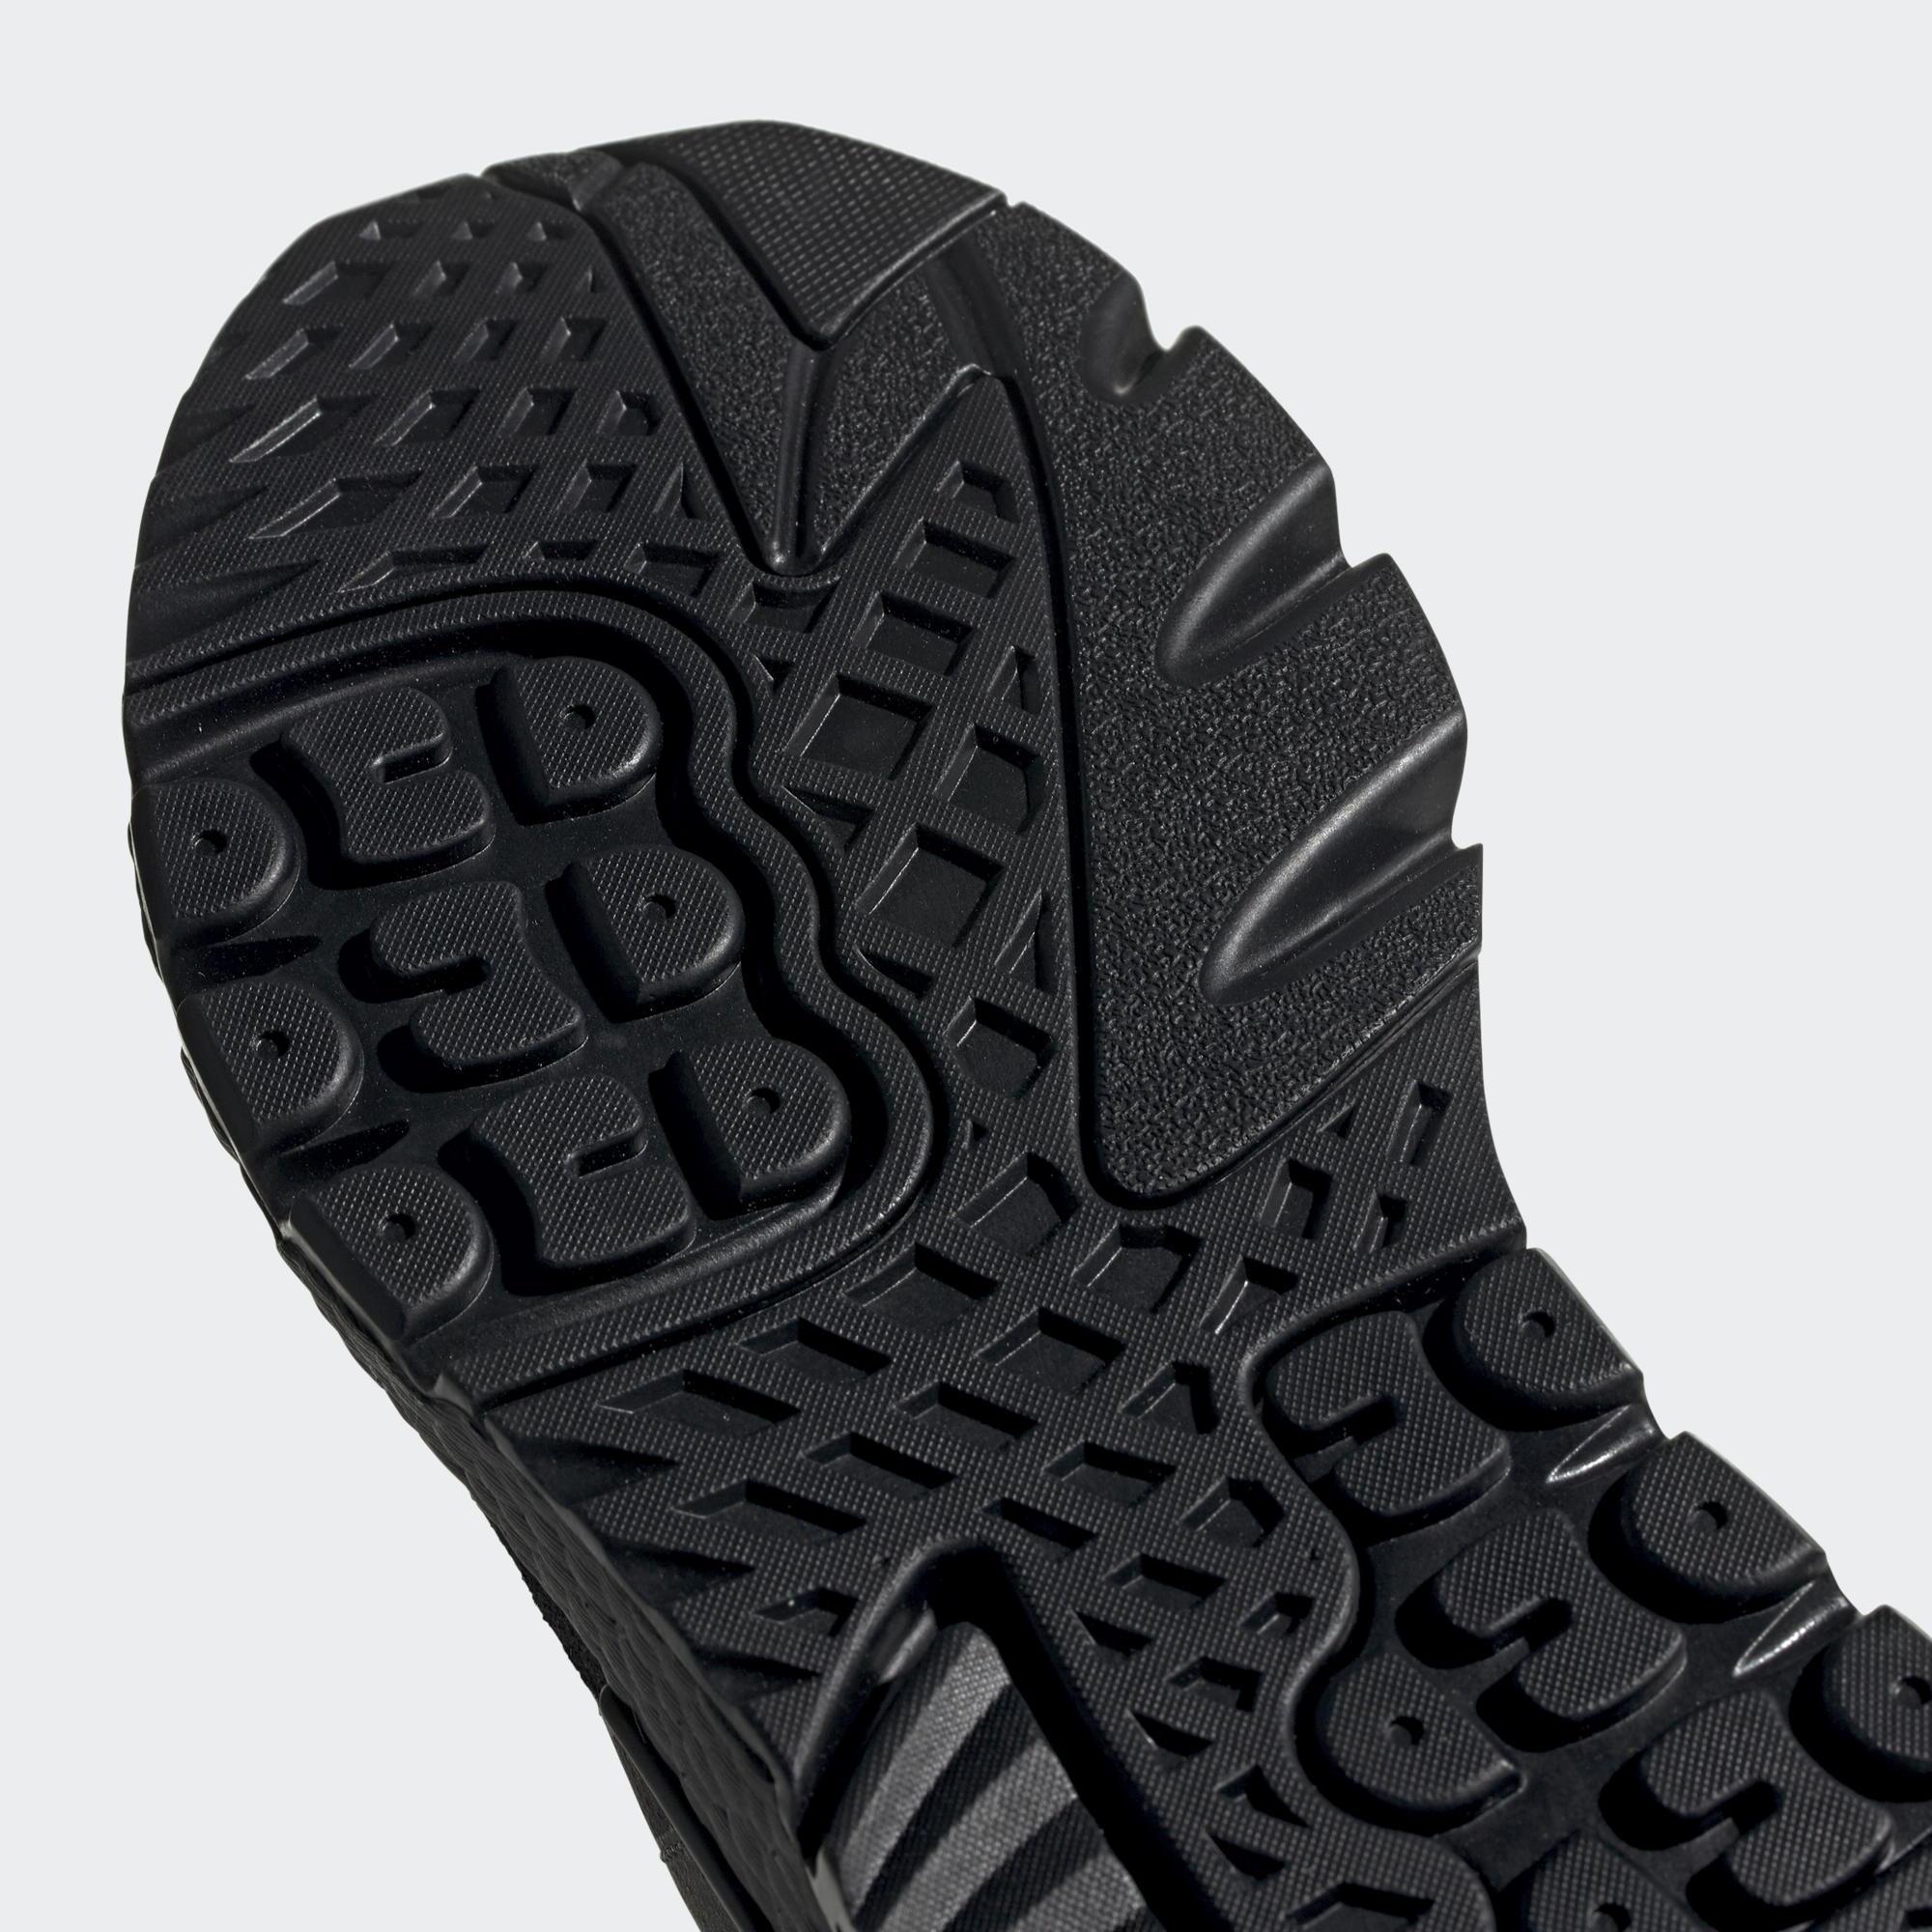 【ADIDAS】 NITE JOGGER 休閒鞋 慢跑鞋 男 訂價5290 BD7954 (Palace store) 6